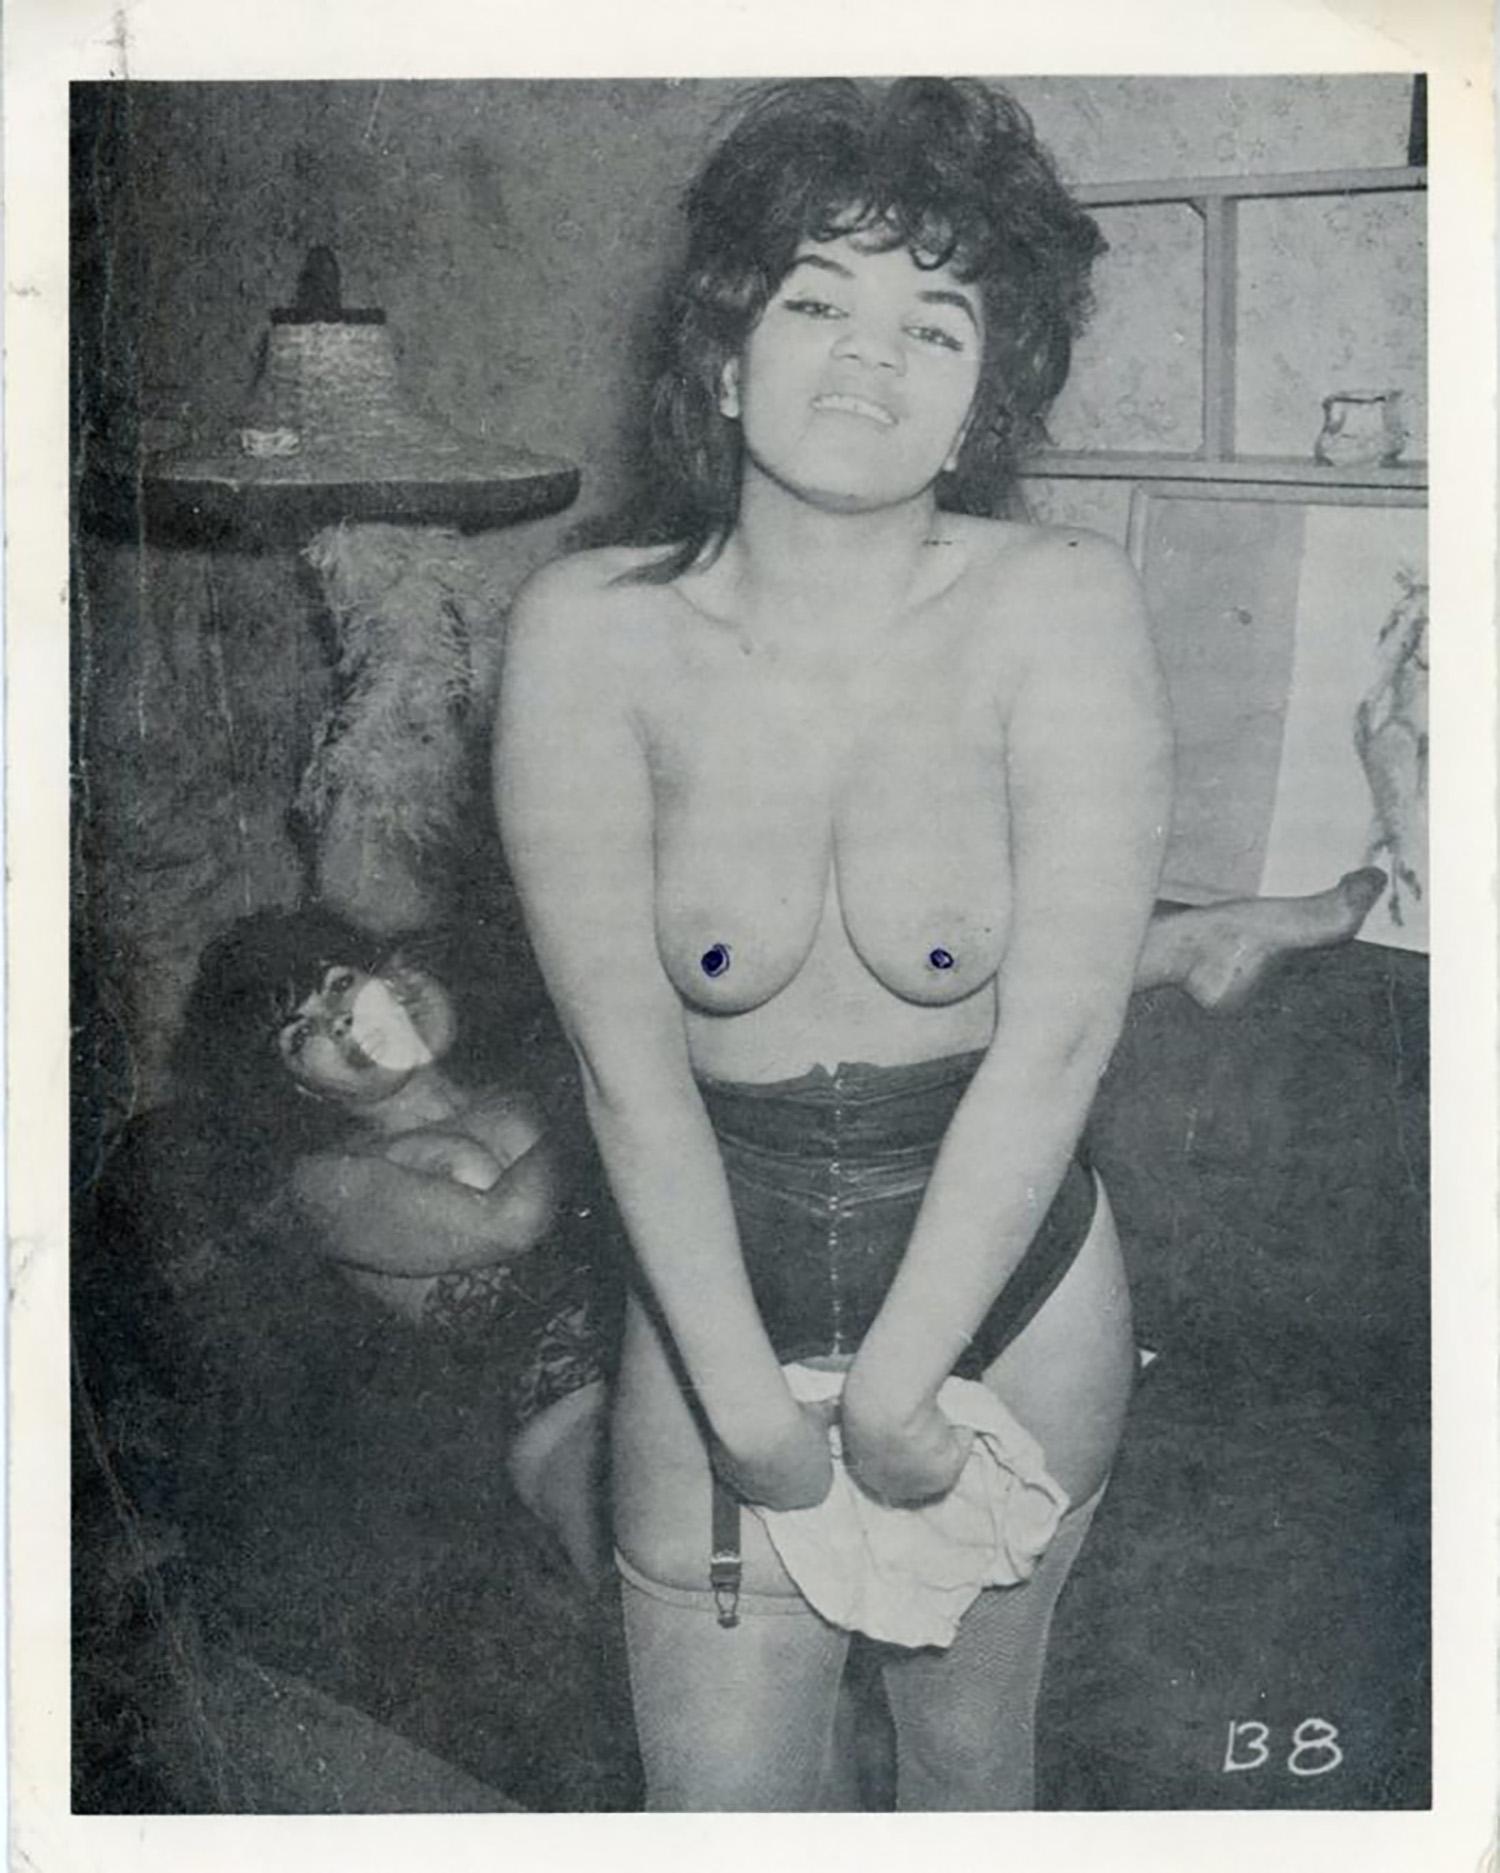 Mudd Club, Tina L'hotsky, Cha-Cha Party, Card, 1978